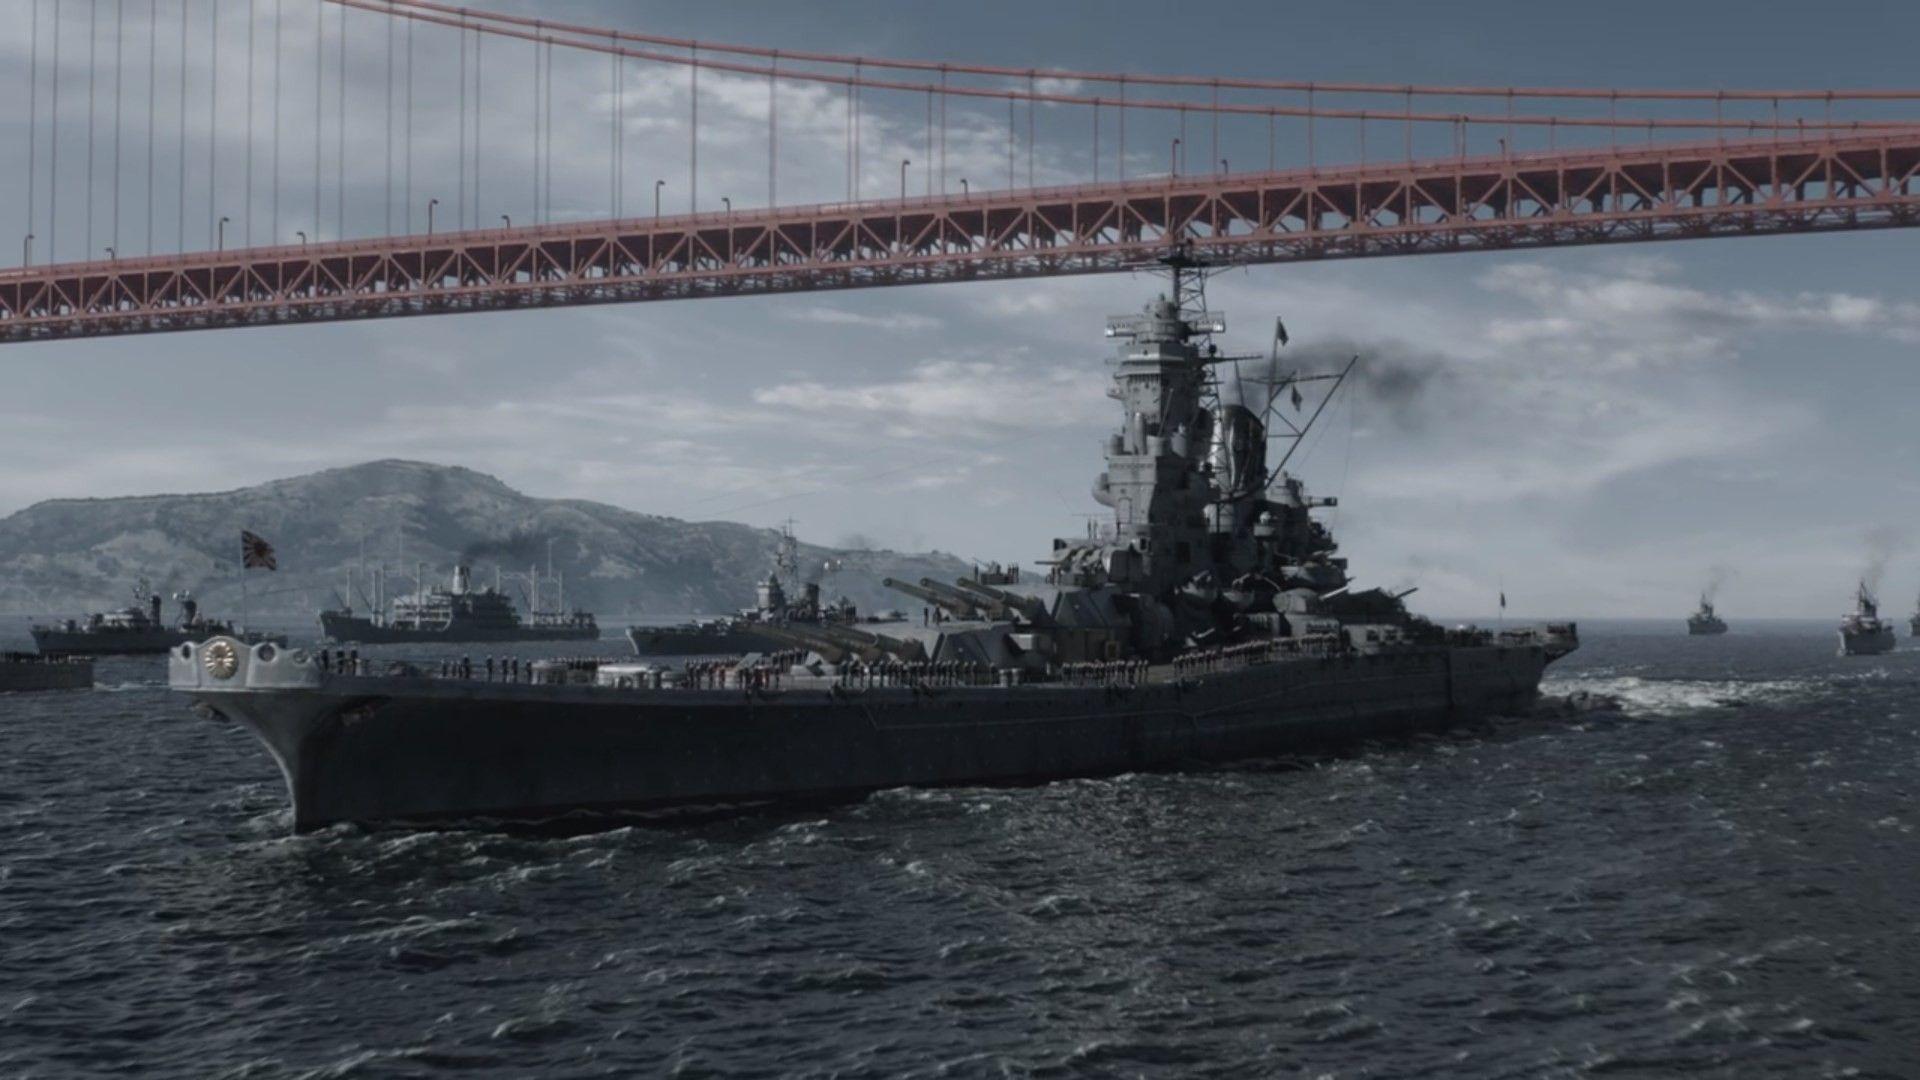 Artstation Man In The High Castle Season 3 Episodes 1 3 Ben Mcdougal Battleship Yamato Highcastle 37t High Castle Castle Season Yamato Class Battleship